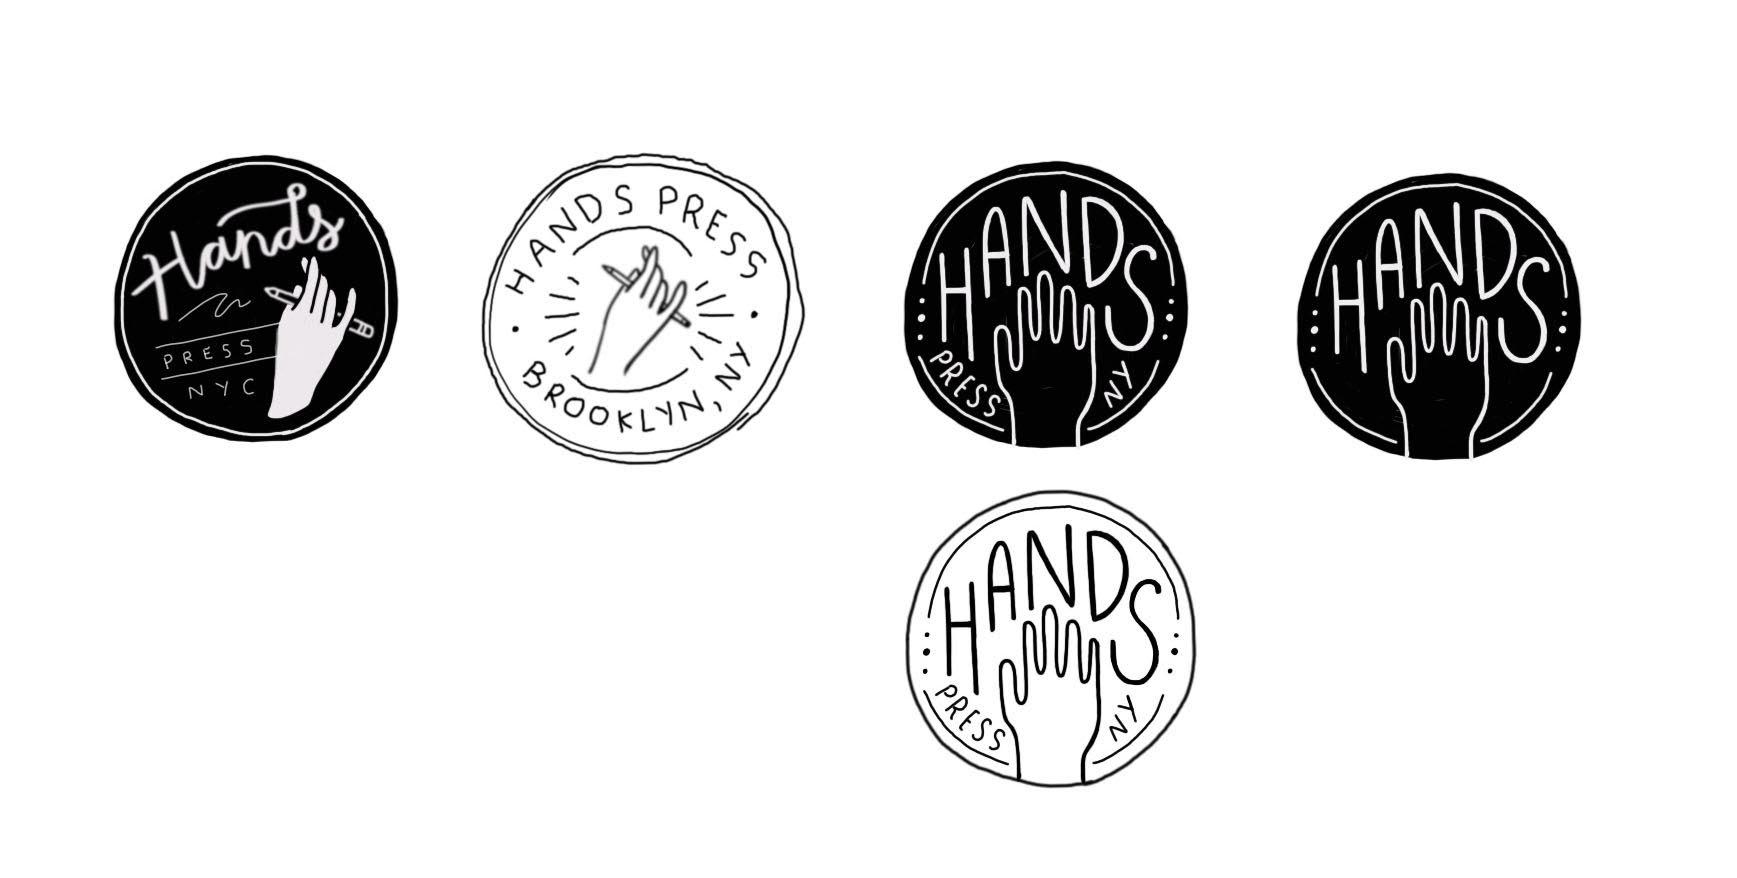 Initial logo idea sketches.